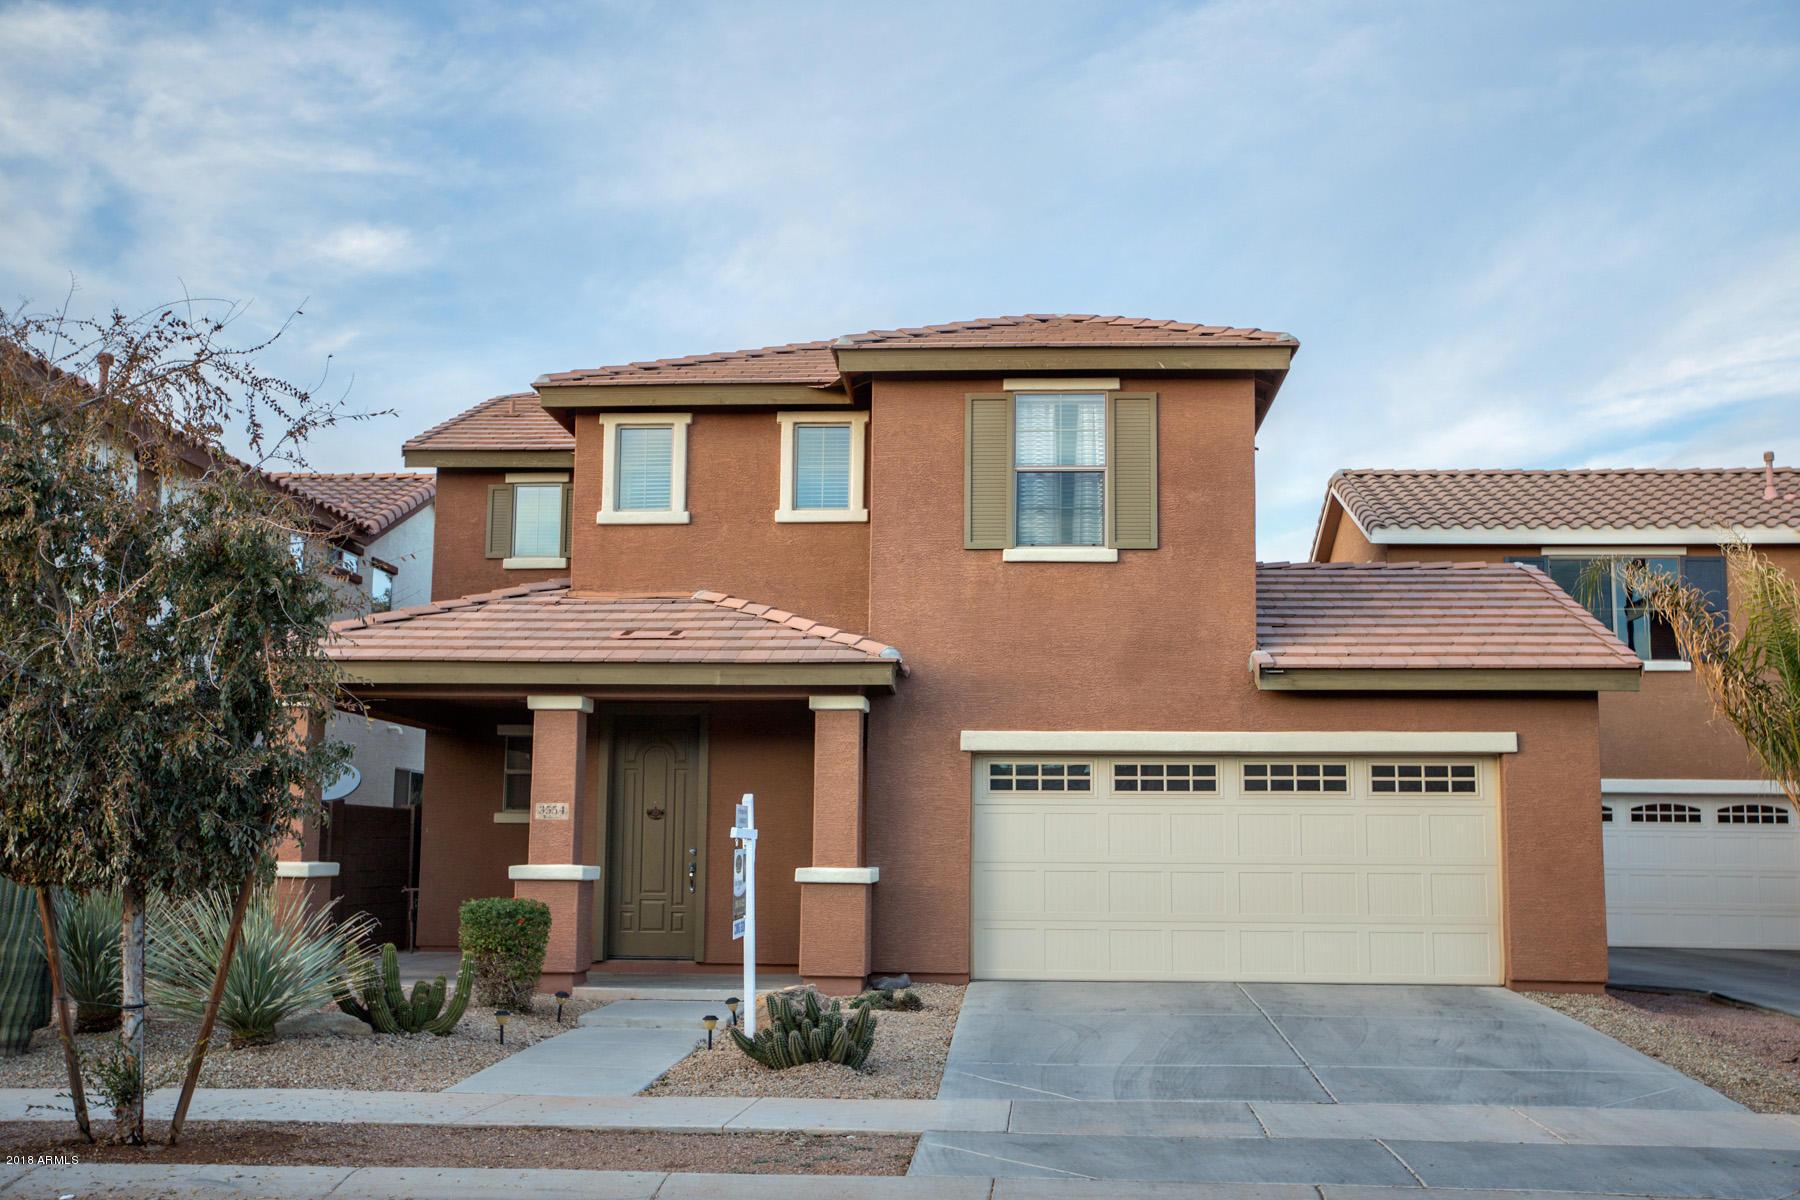 Photo of 3554 E TULSA Street, Gilbert, AZ 85295